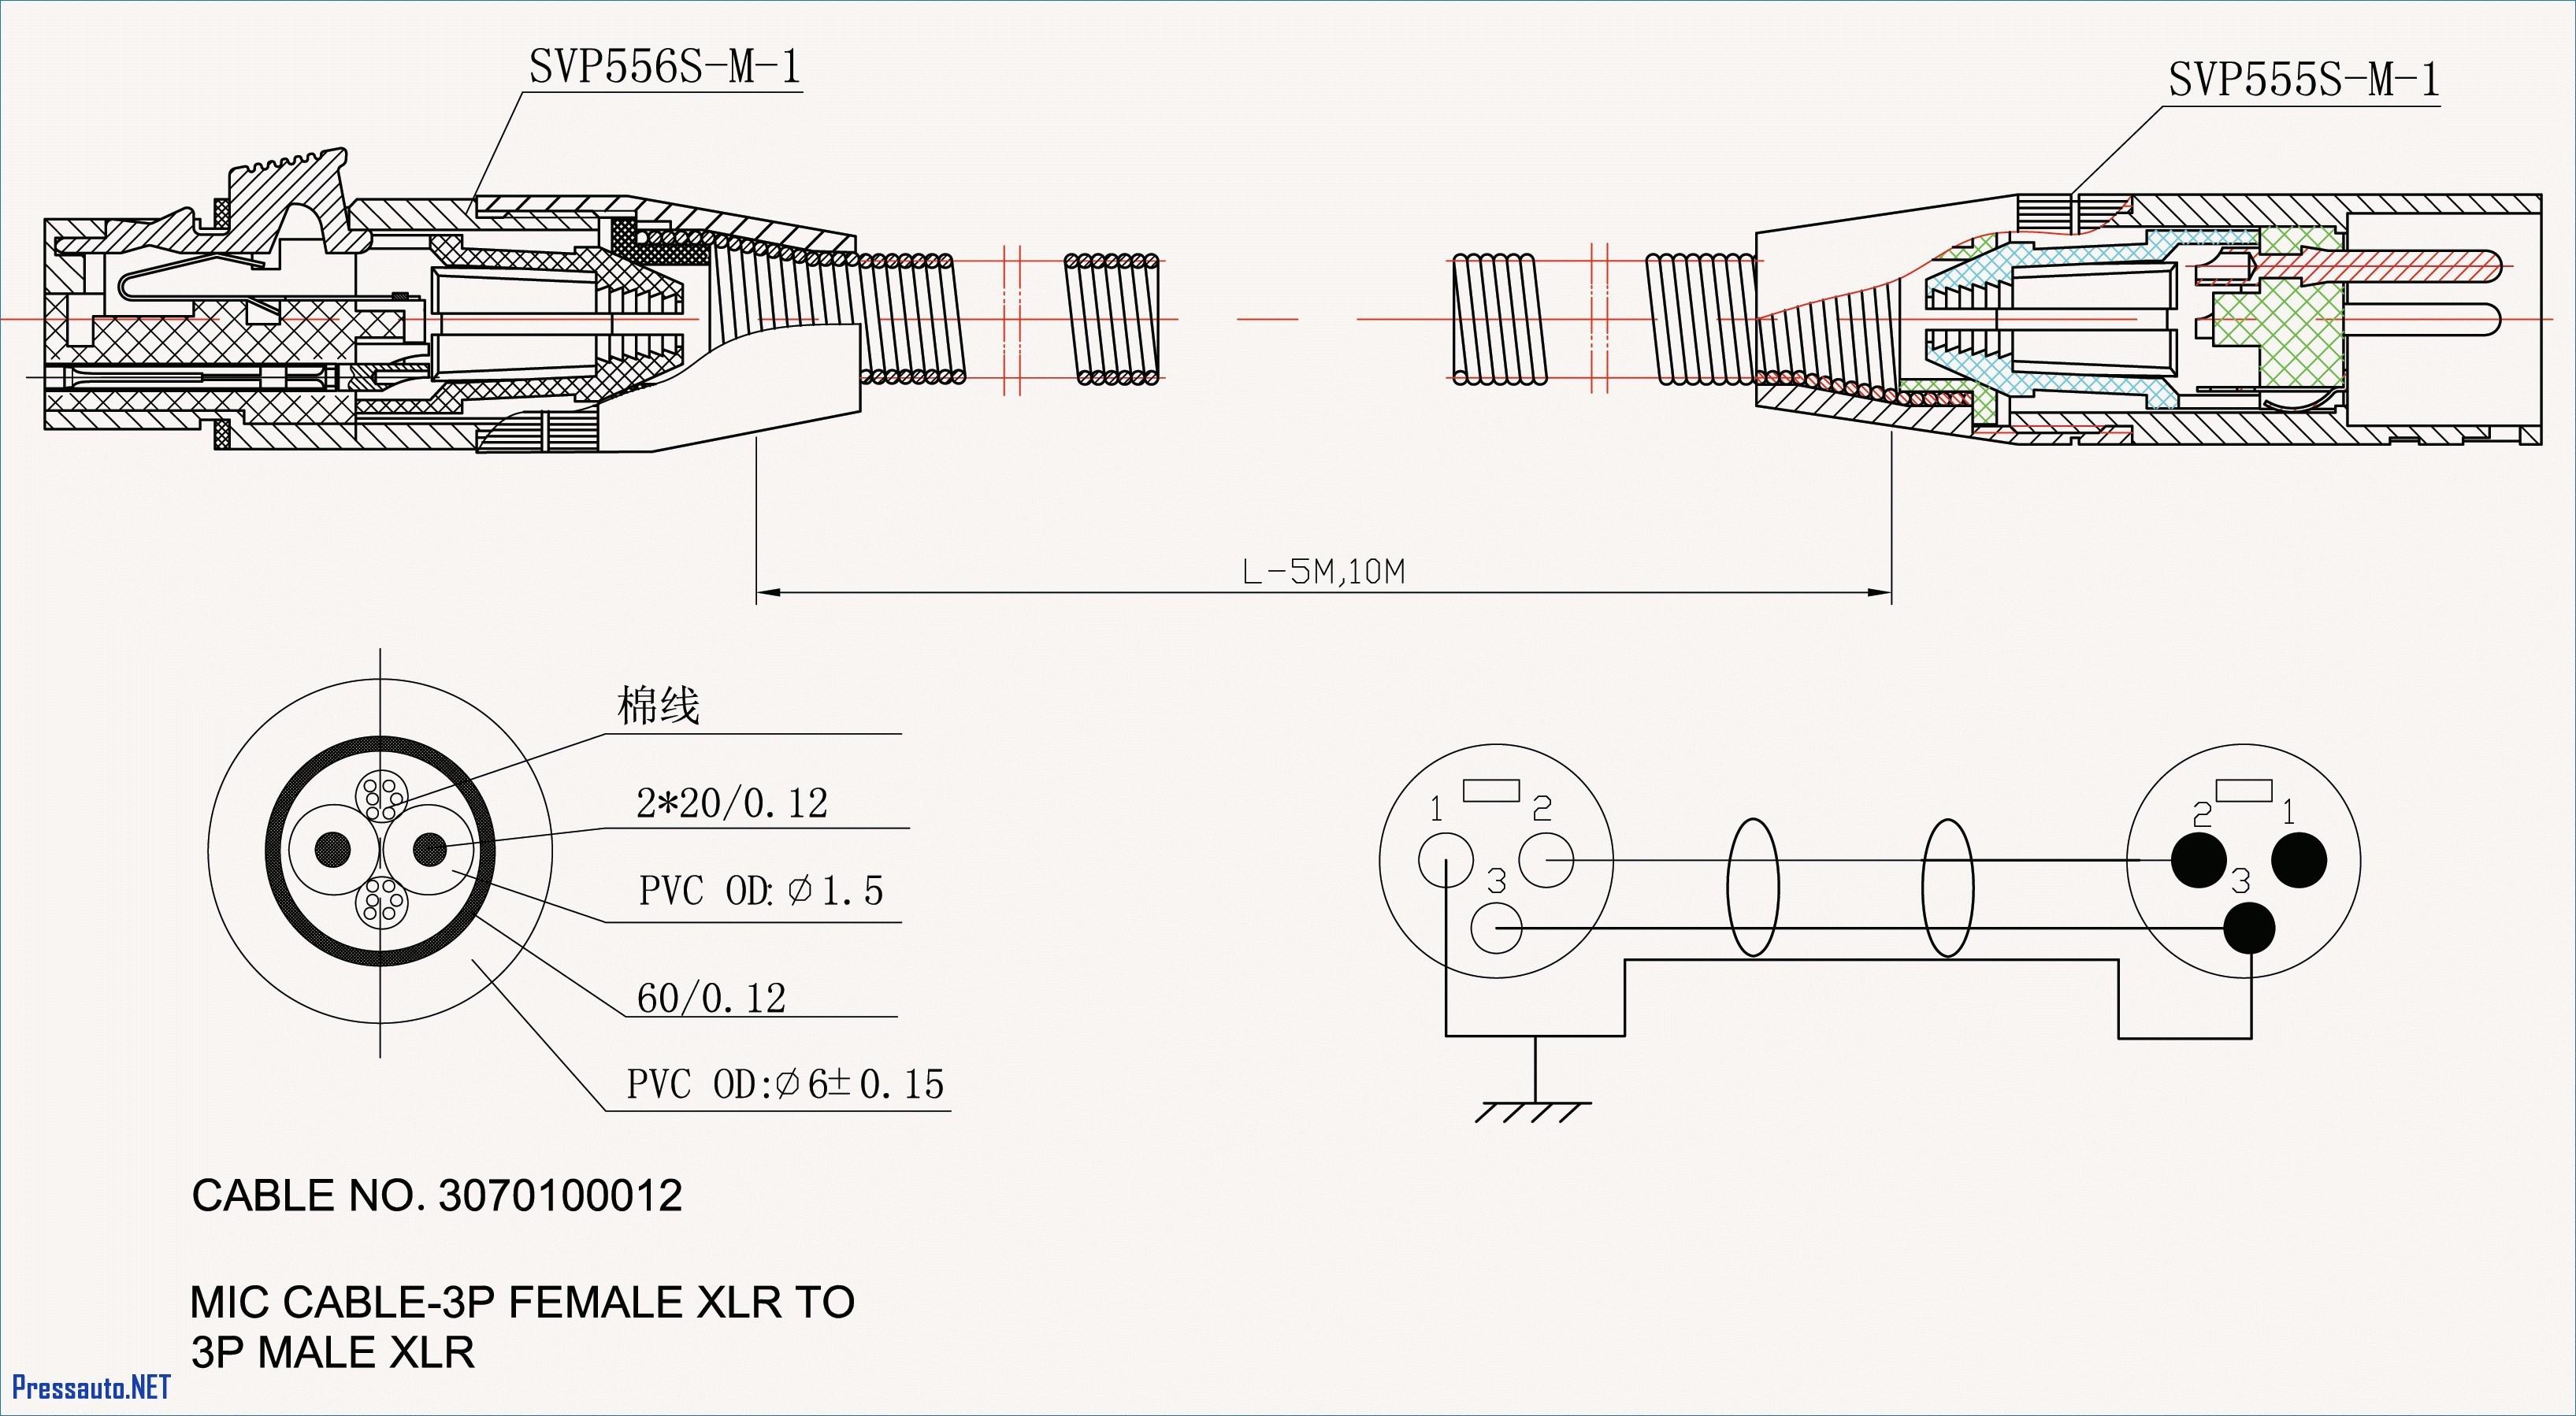 Electric Motor Wiring Diagram Single Phase Wiring Diagram Yamaha Aerox Save Electric Motor Wiring Diagram Of Electric Motor Wiring Diagram Single Phase